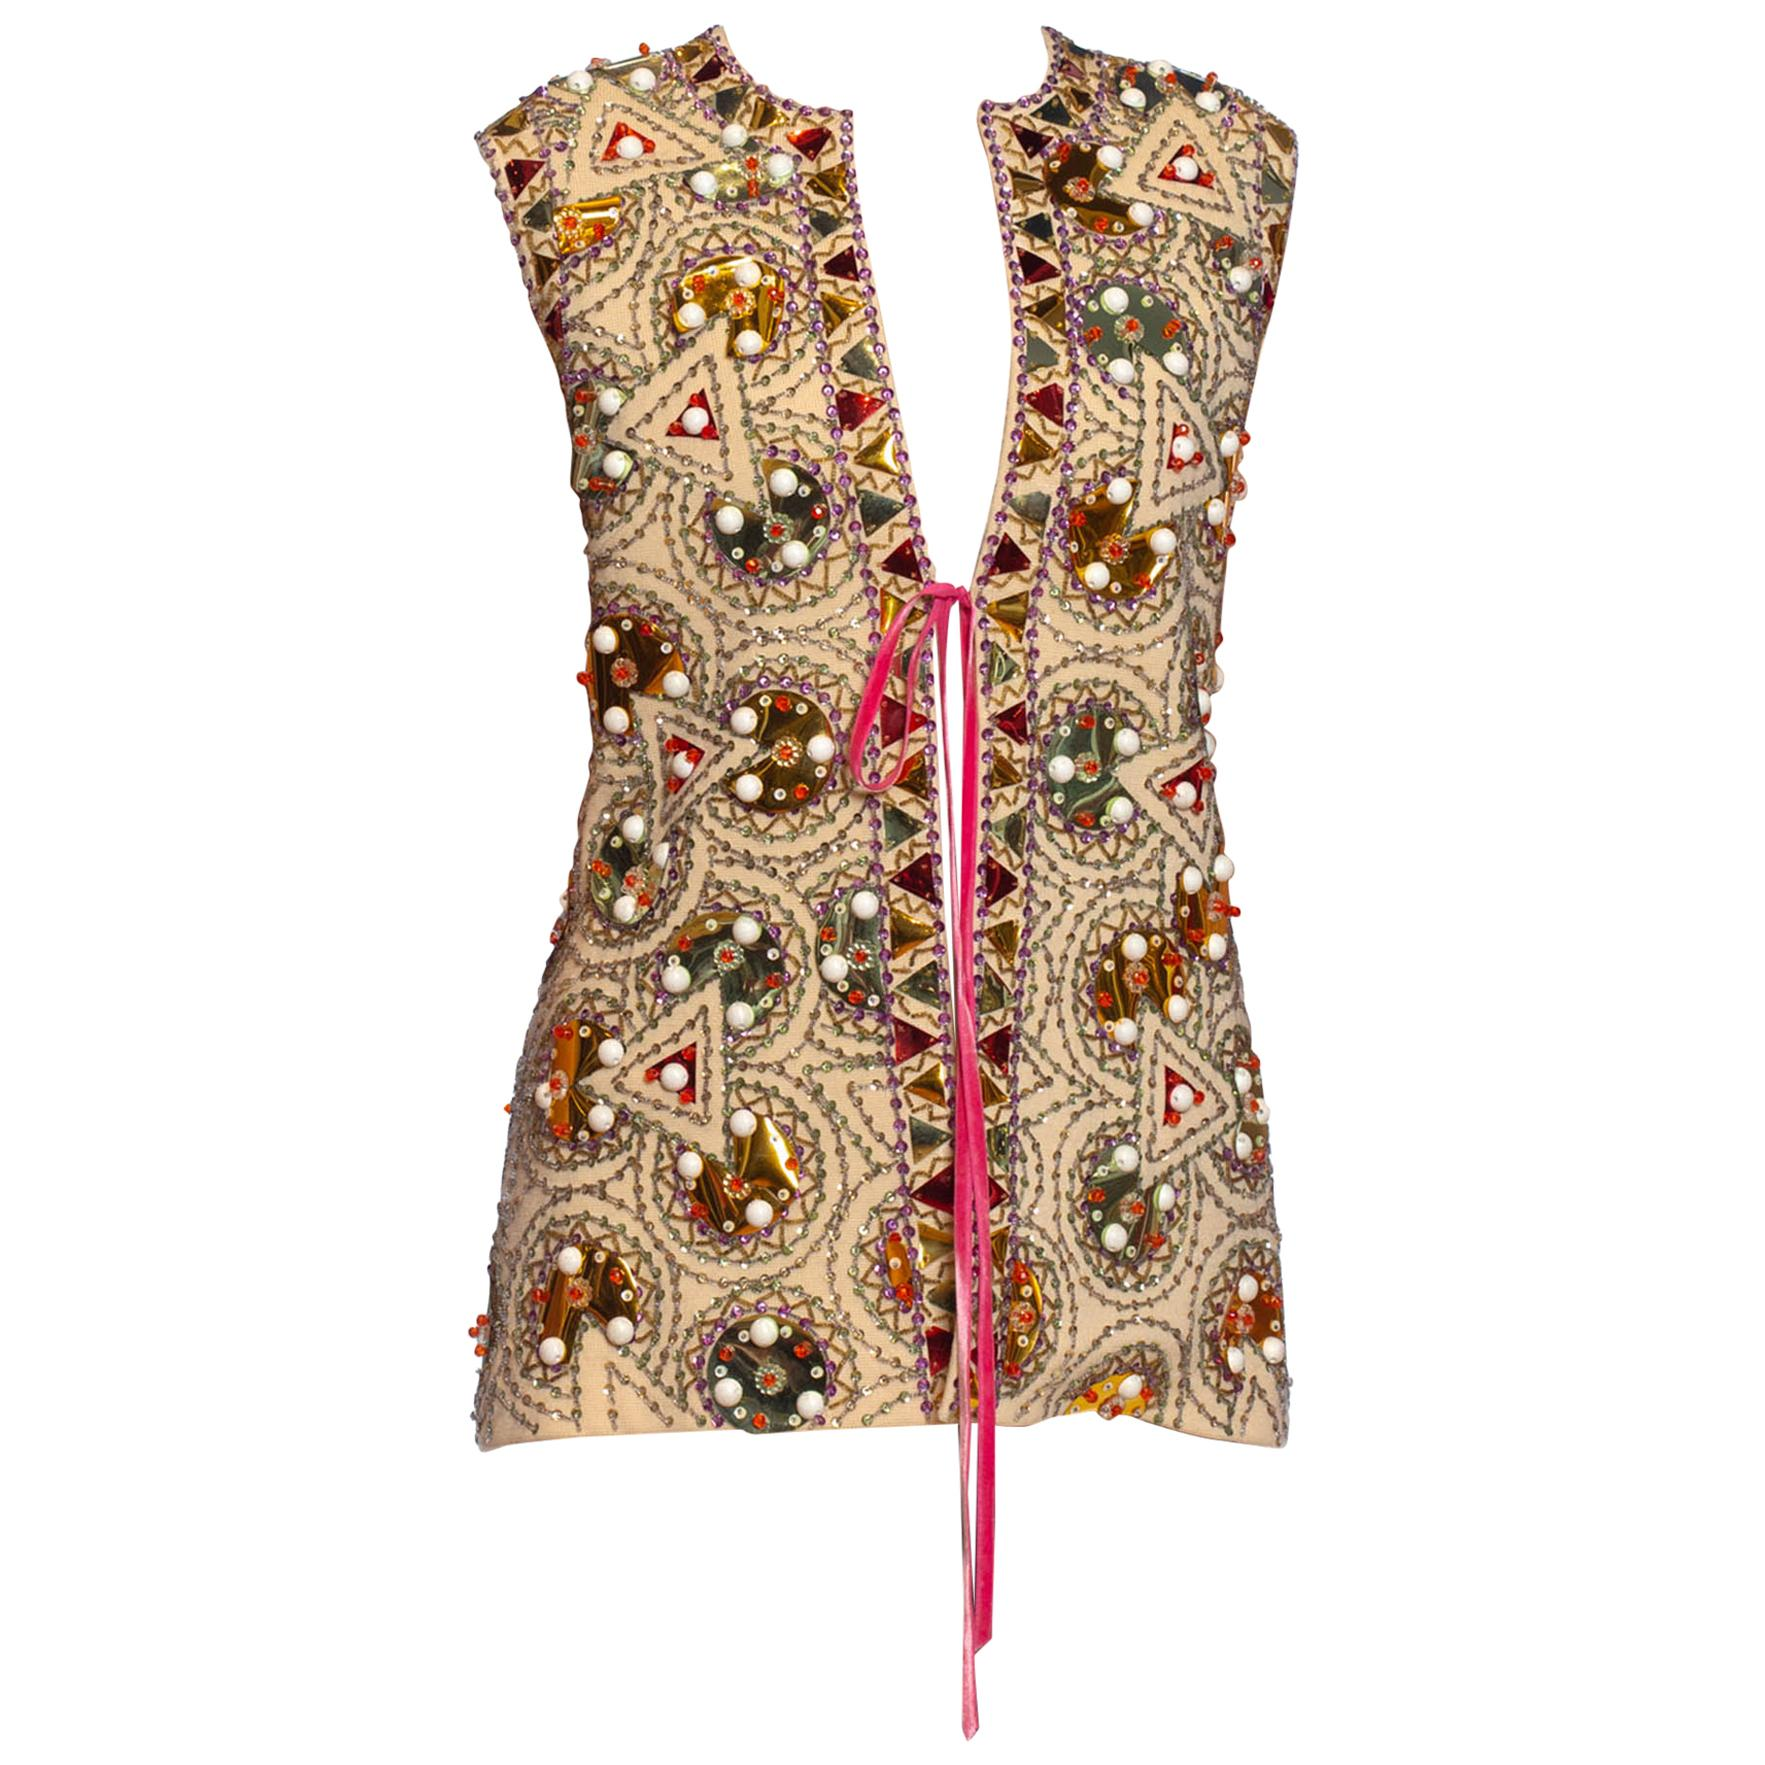 1960S LILLI ANN Cream Wool Knit Psychedelic Mod Geometric Beaded Vest